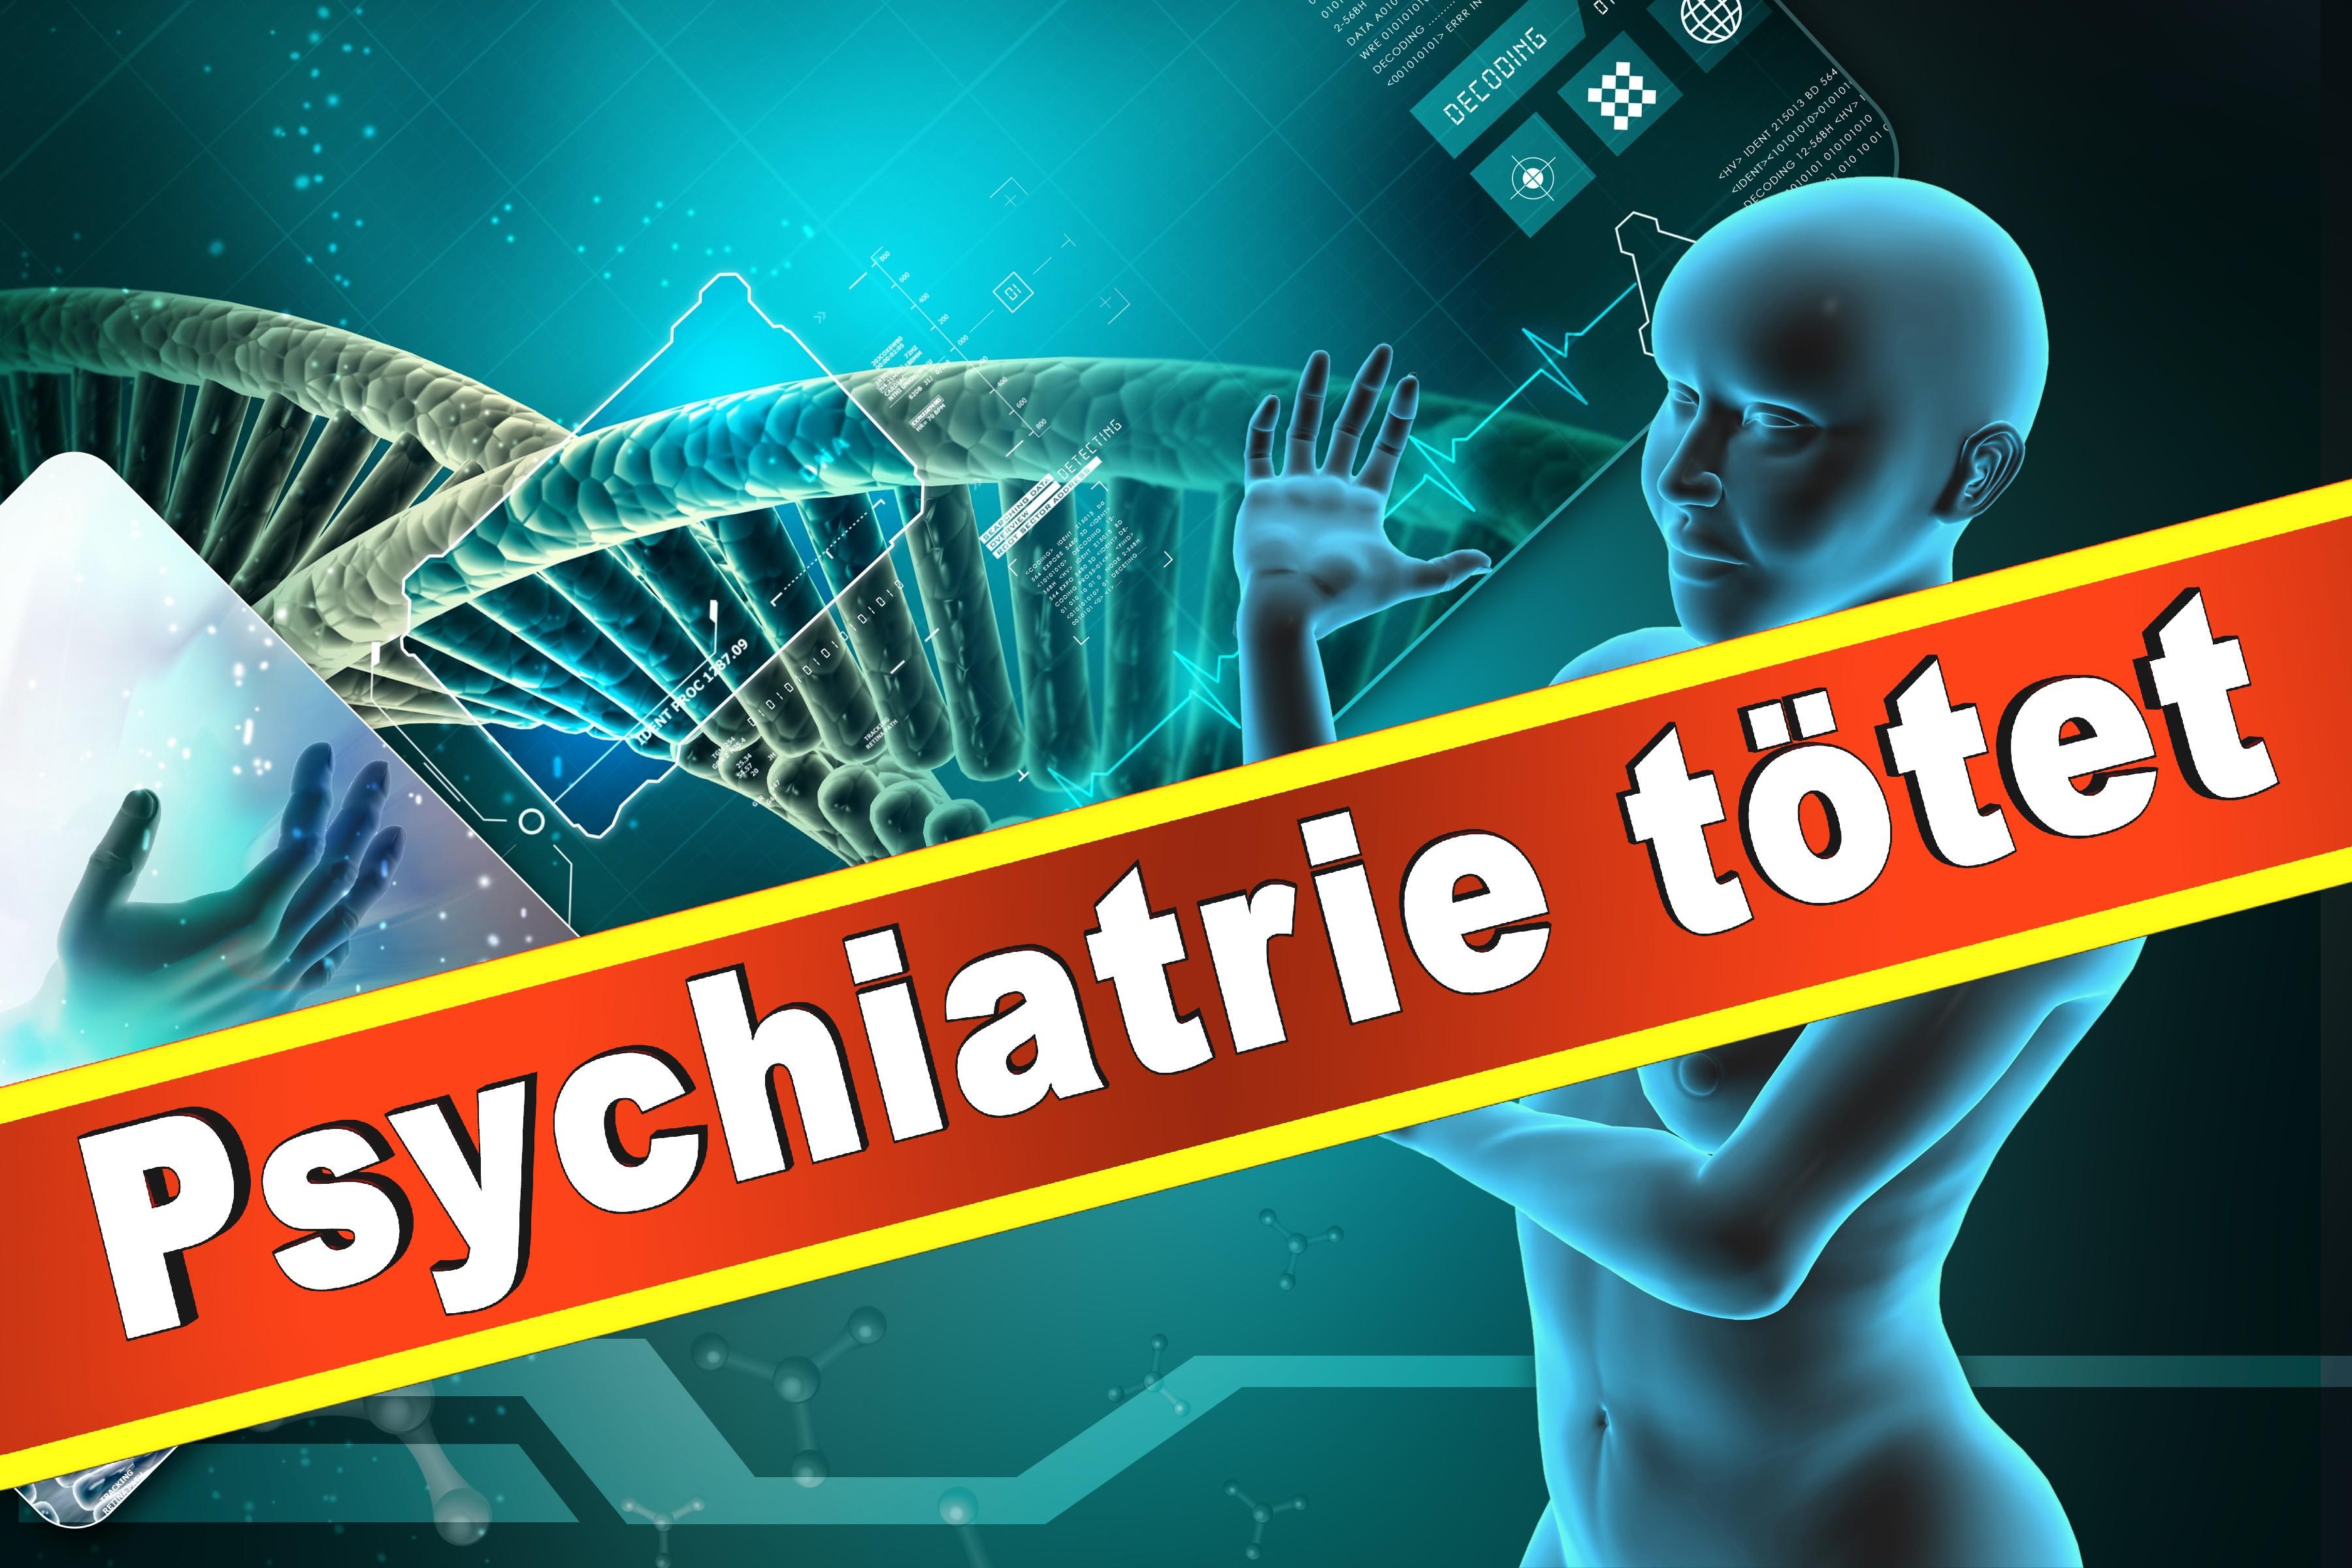 Dr Cornelia Nitschke Psychotherapeut Hannover Gutachten Psychiater Facharzt Psychiatrie